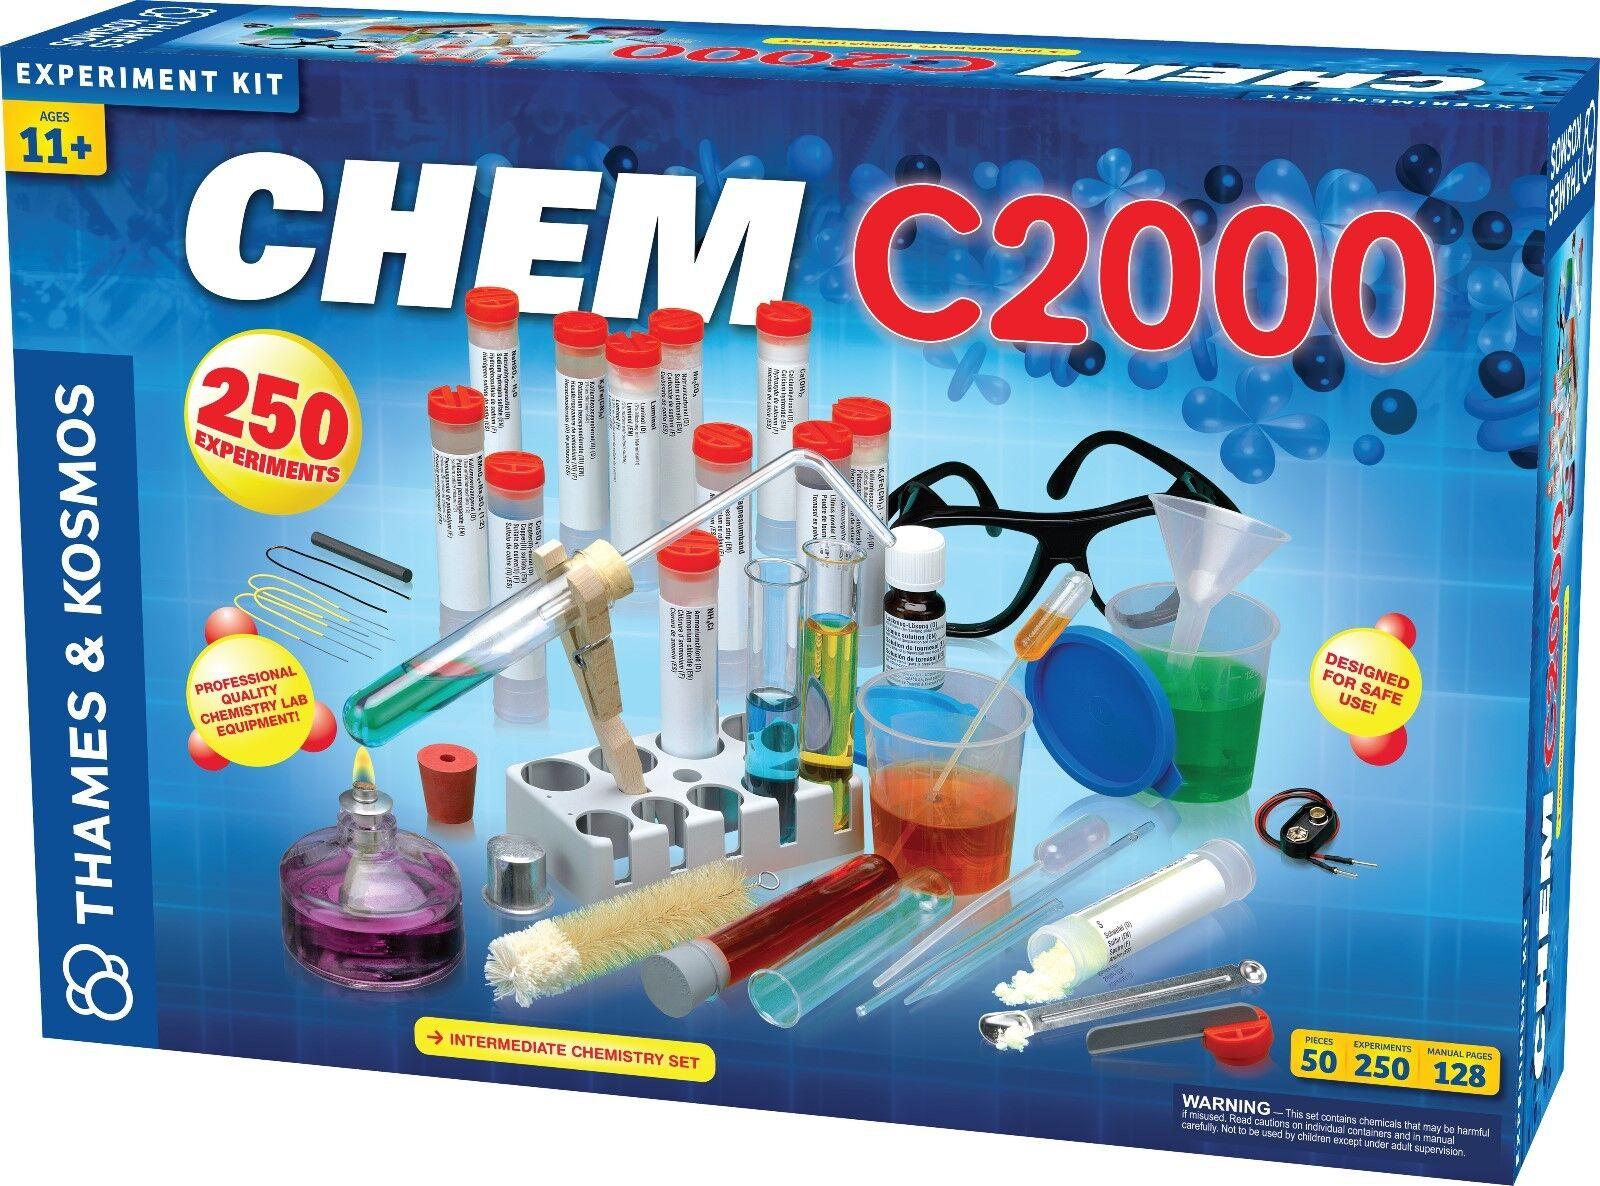 Thames And Kosmos Chem C2000 V2.0 Kit ciencia química